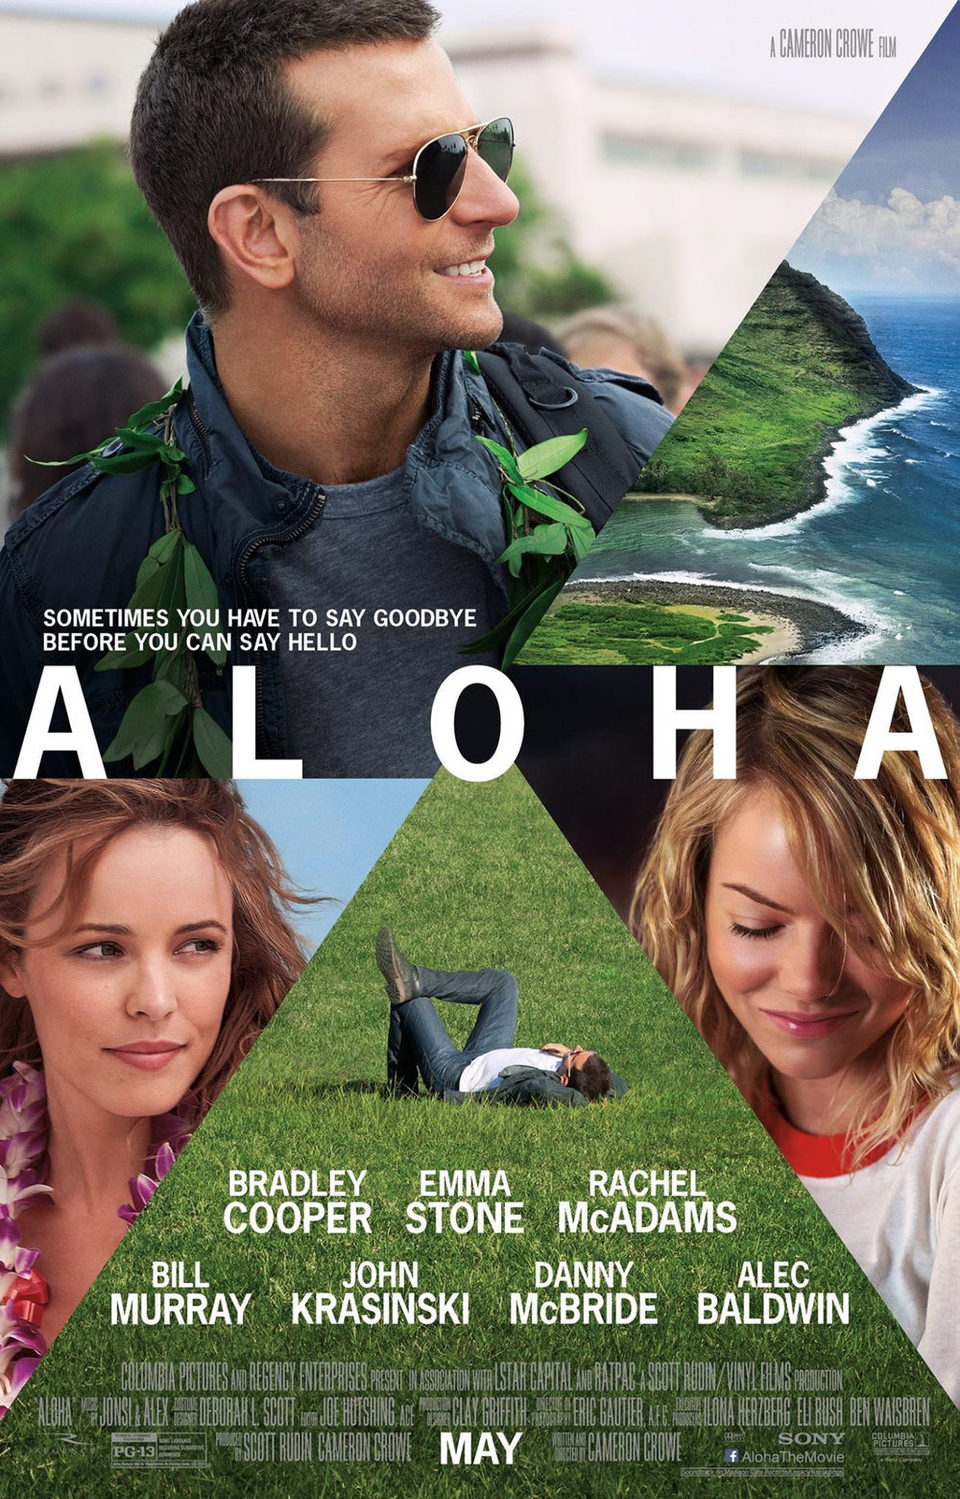 Cartel Estados Unidos de 'Aloha'